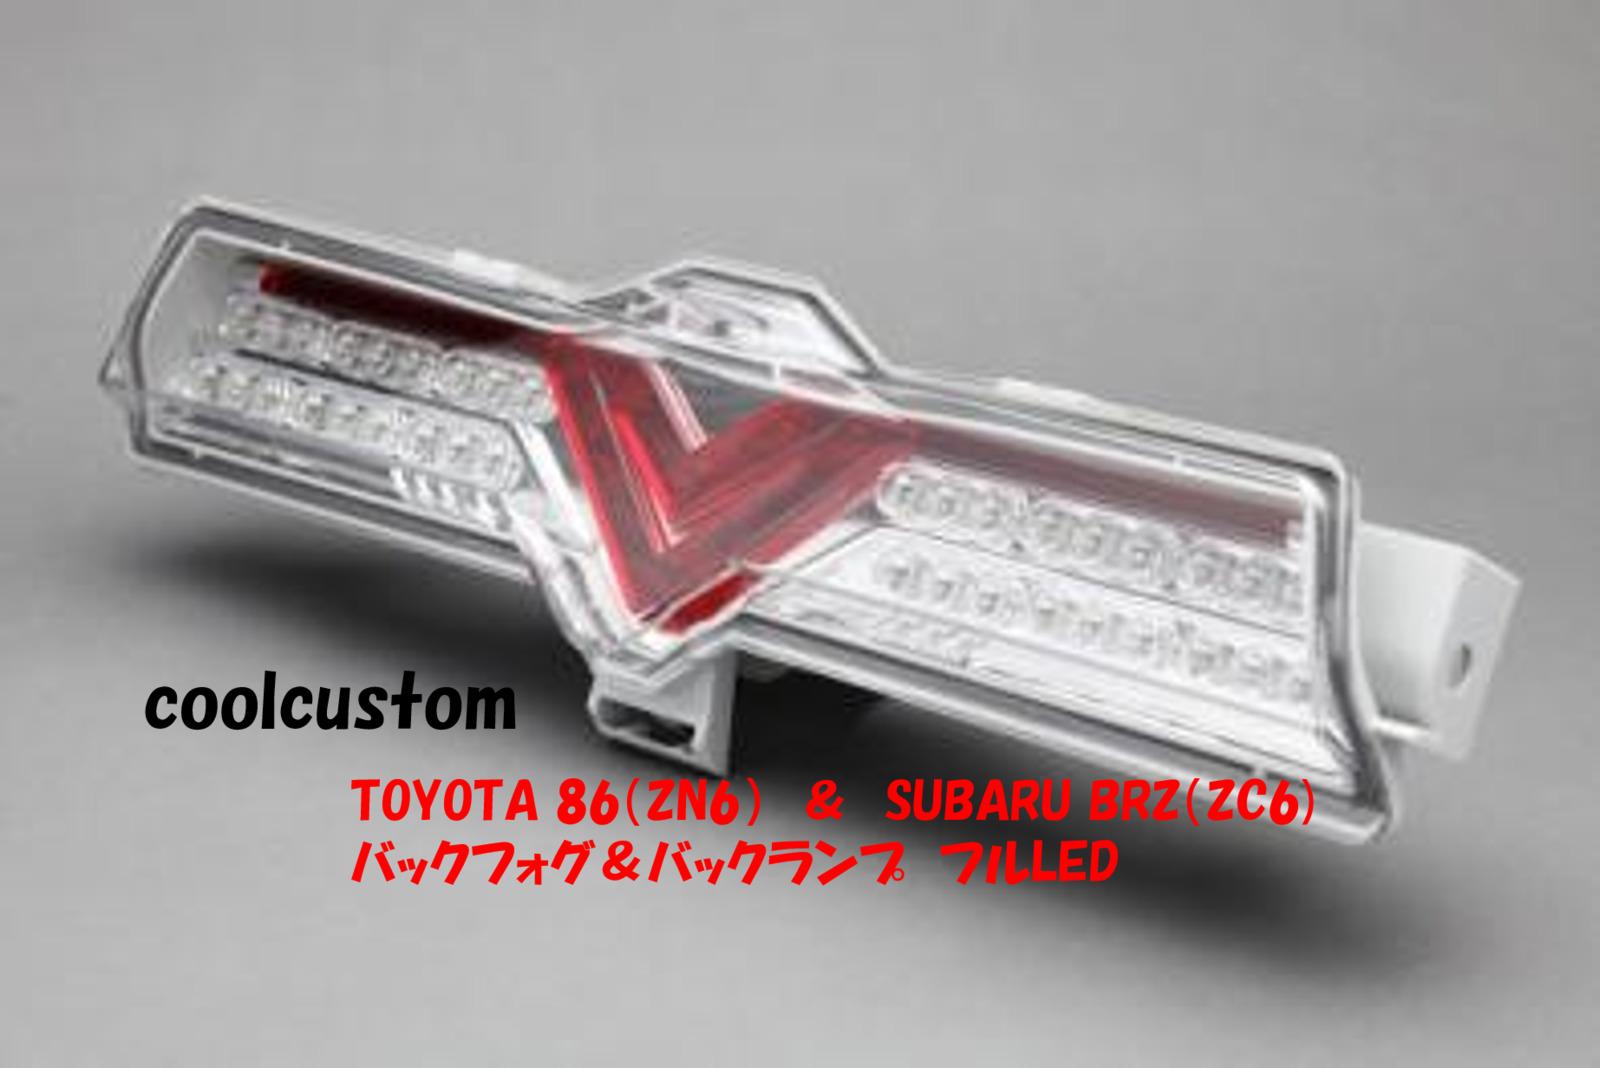 TOYOTA 86【ZN6】&SUBARU BRZ【ZC6】バックフォグ&バックランプ フルLED シルバー/レッドメーカー名 SoulMates商品番号 GTA-009